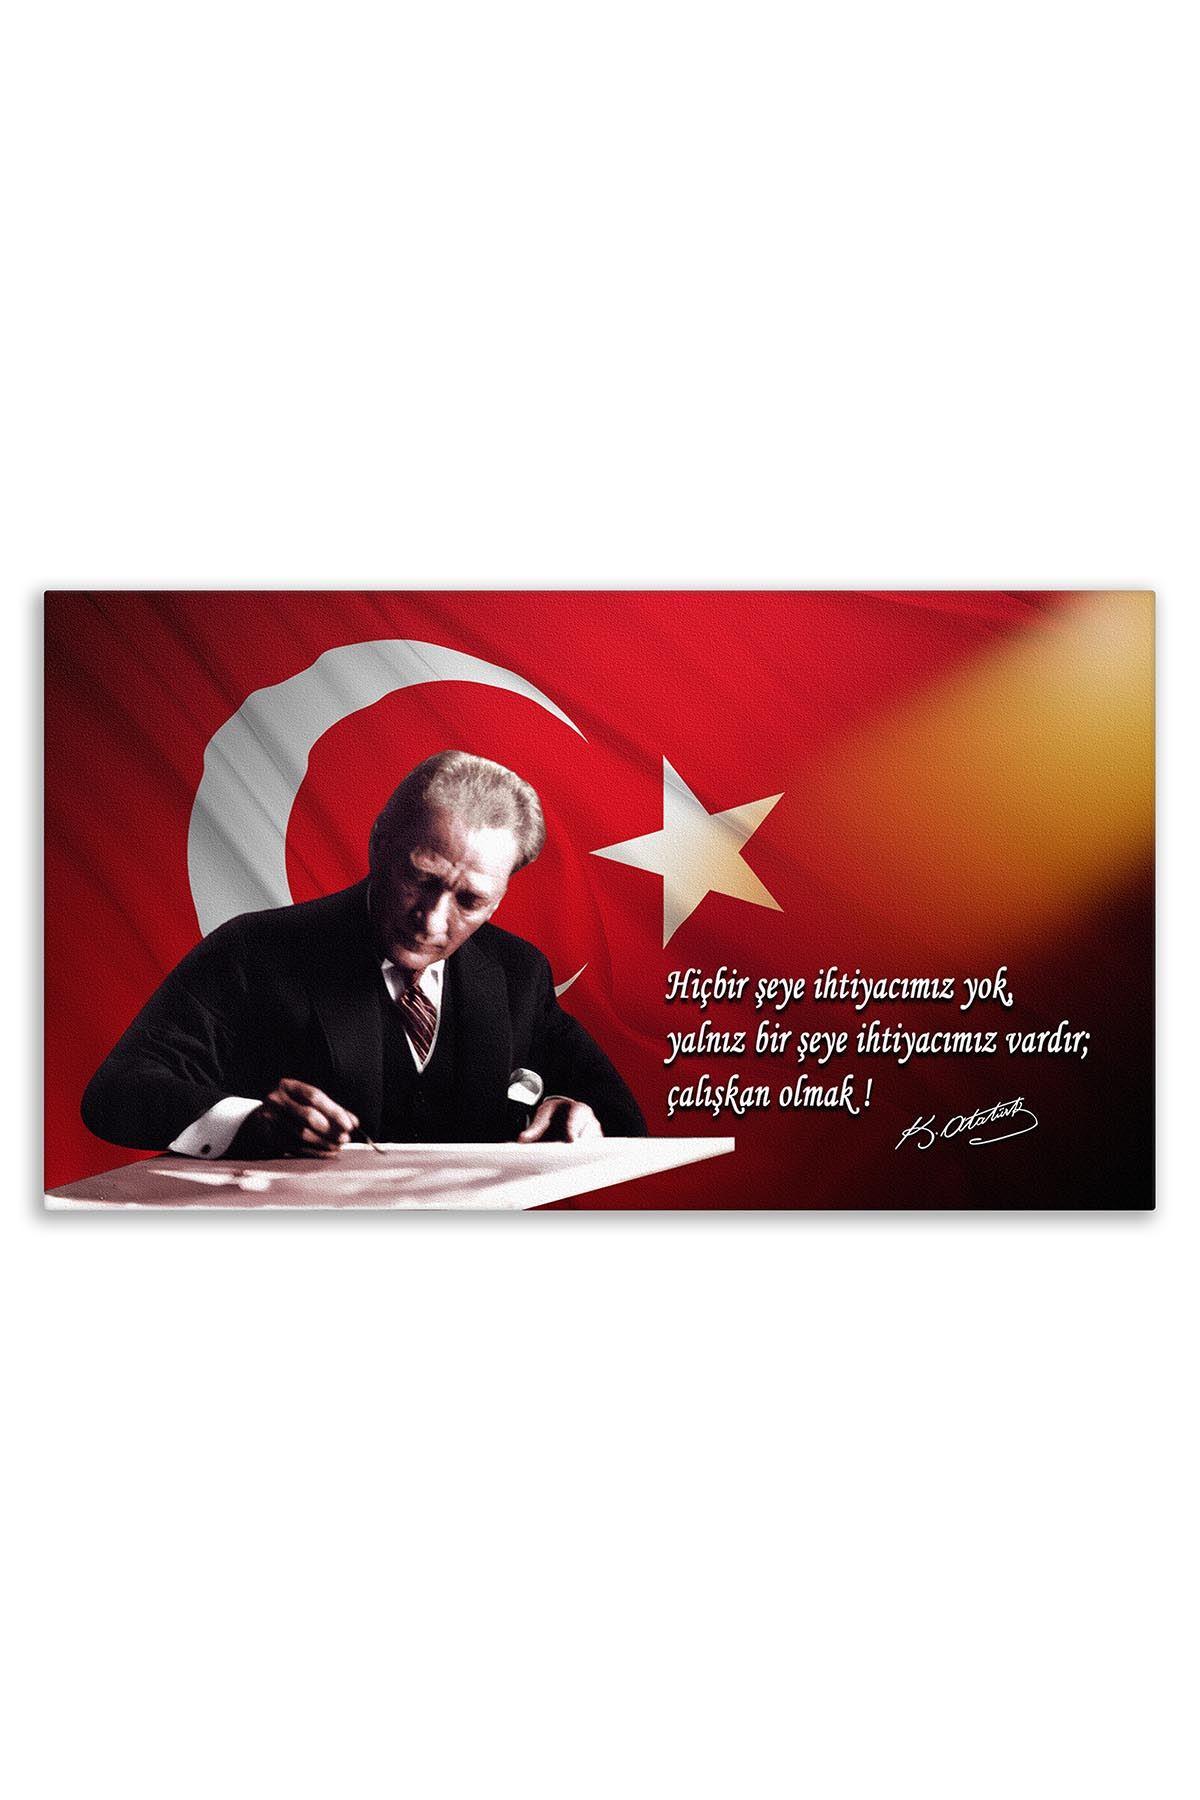 Atatürk Canvas Board With Turkish Flag | Printed Canvas Board